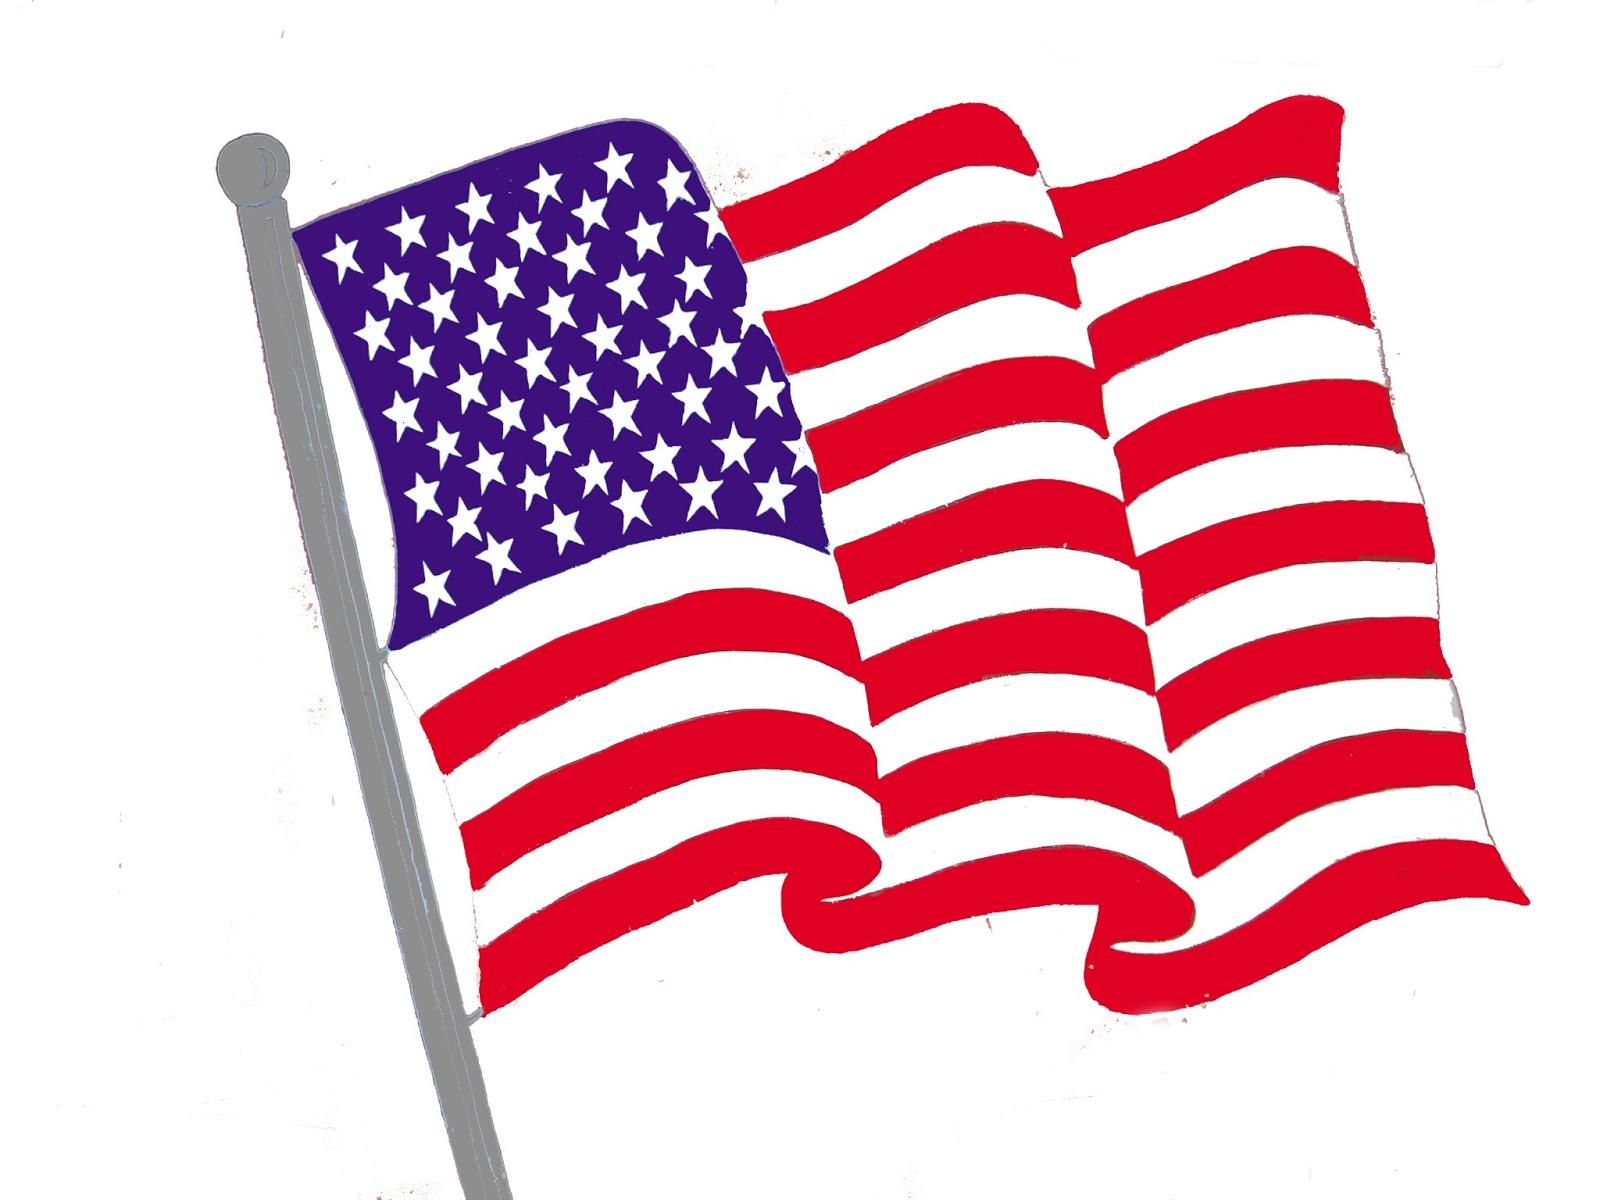 d70d8107dbf587f446021b6deb1c14 ... d70d8107dbf587f446021b6deb1c14 ... Waving American Flag Clip Art . ...